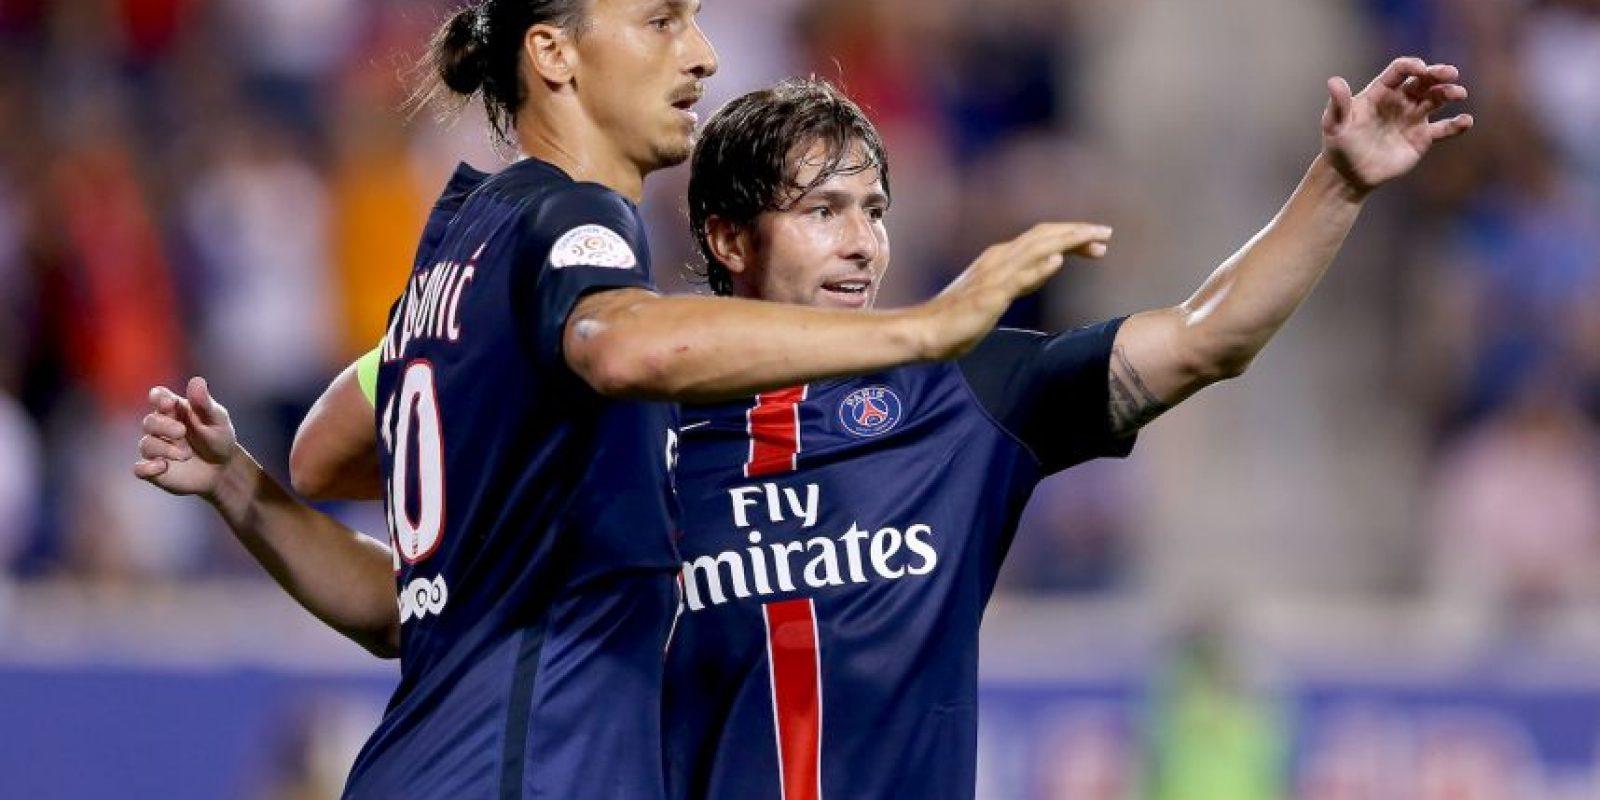 9. Ligue 1 Foto:Getty Images